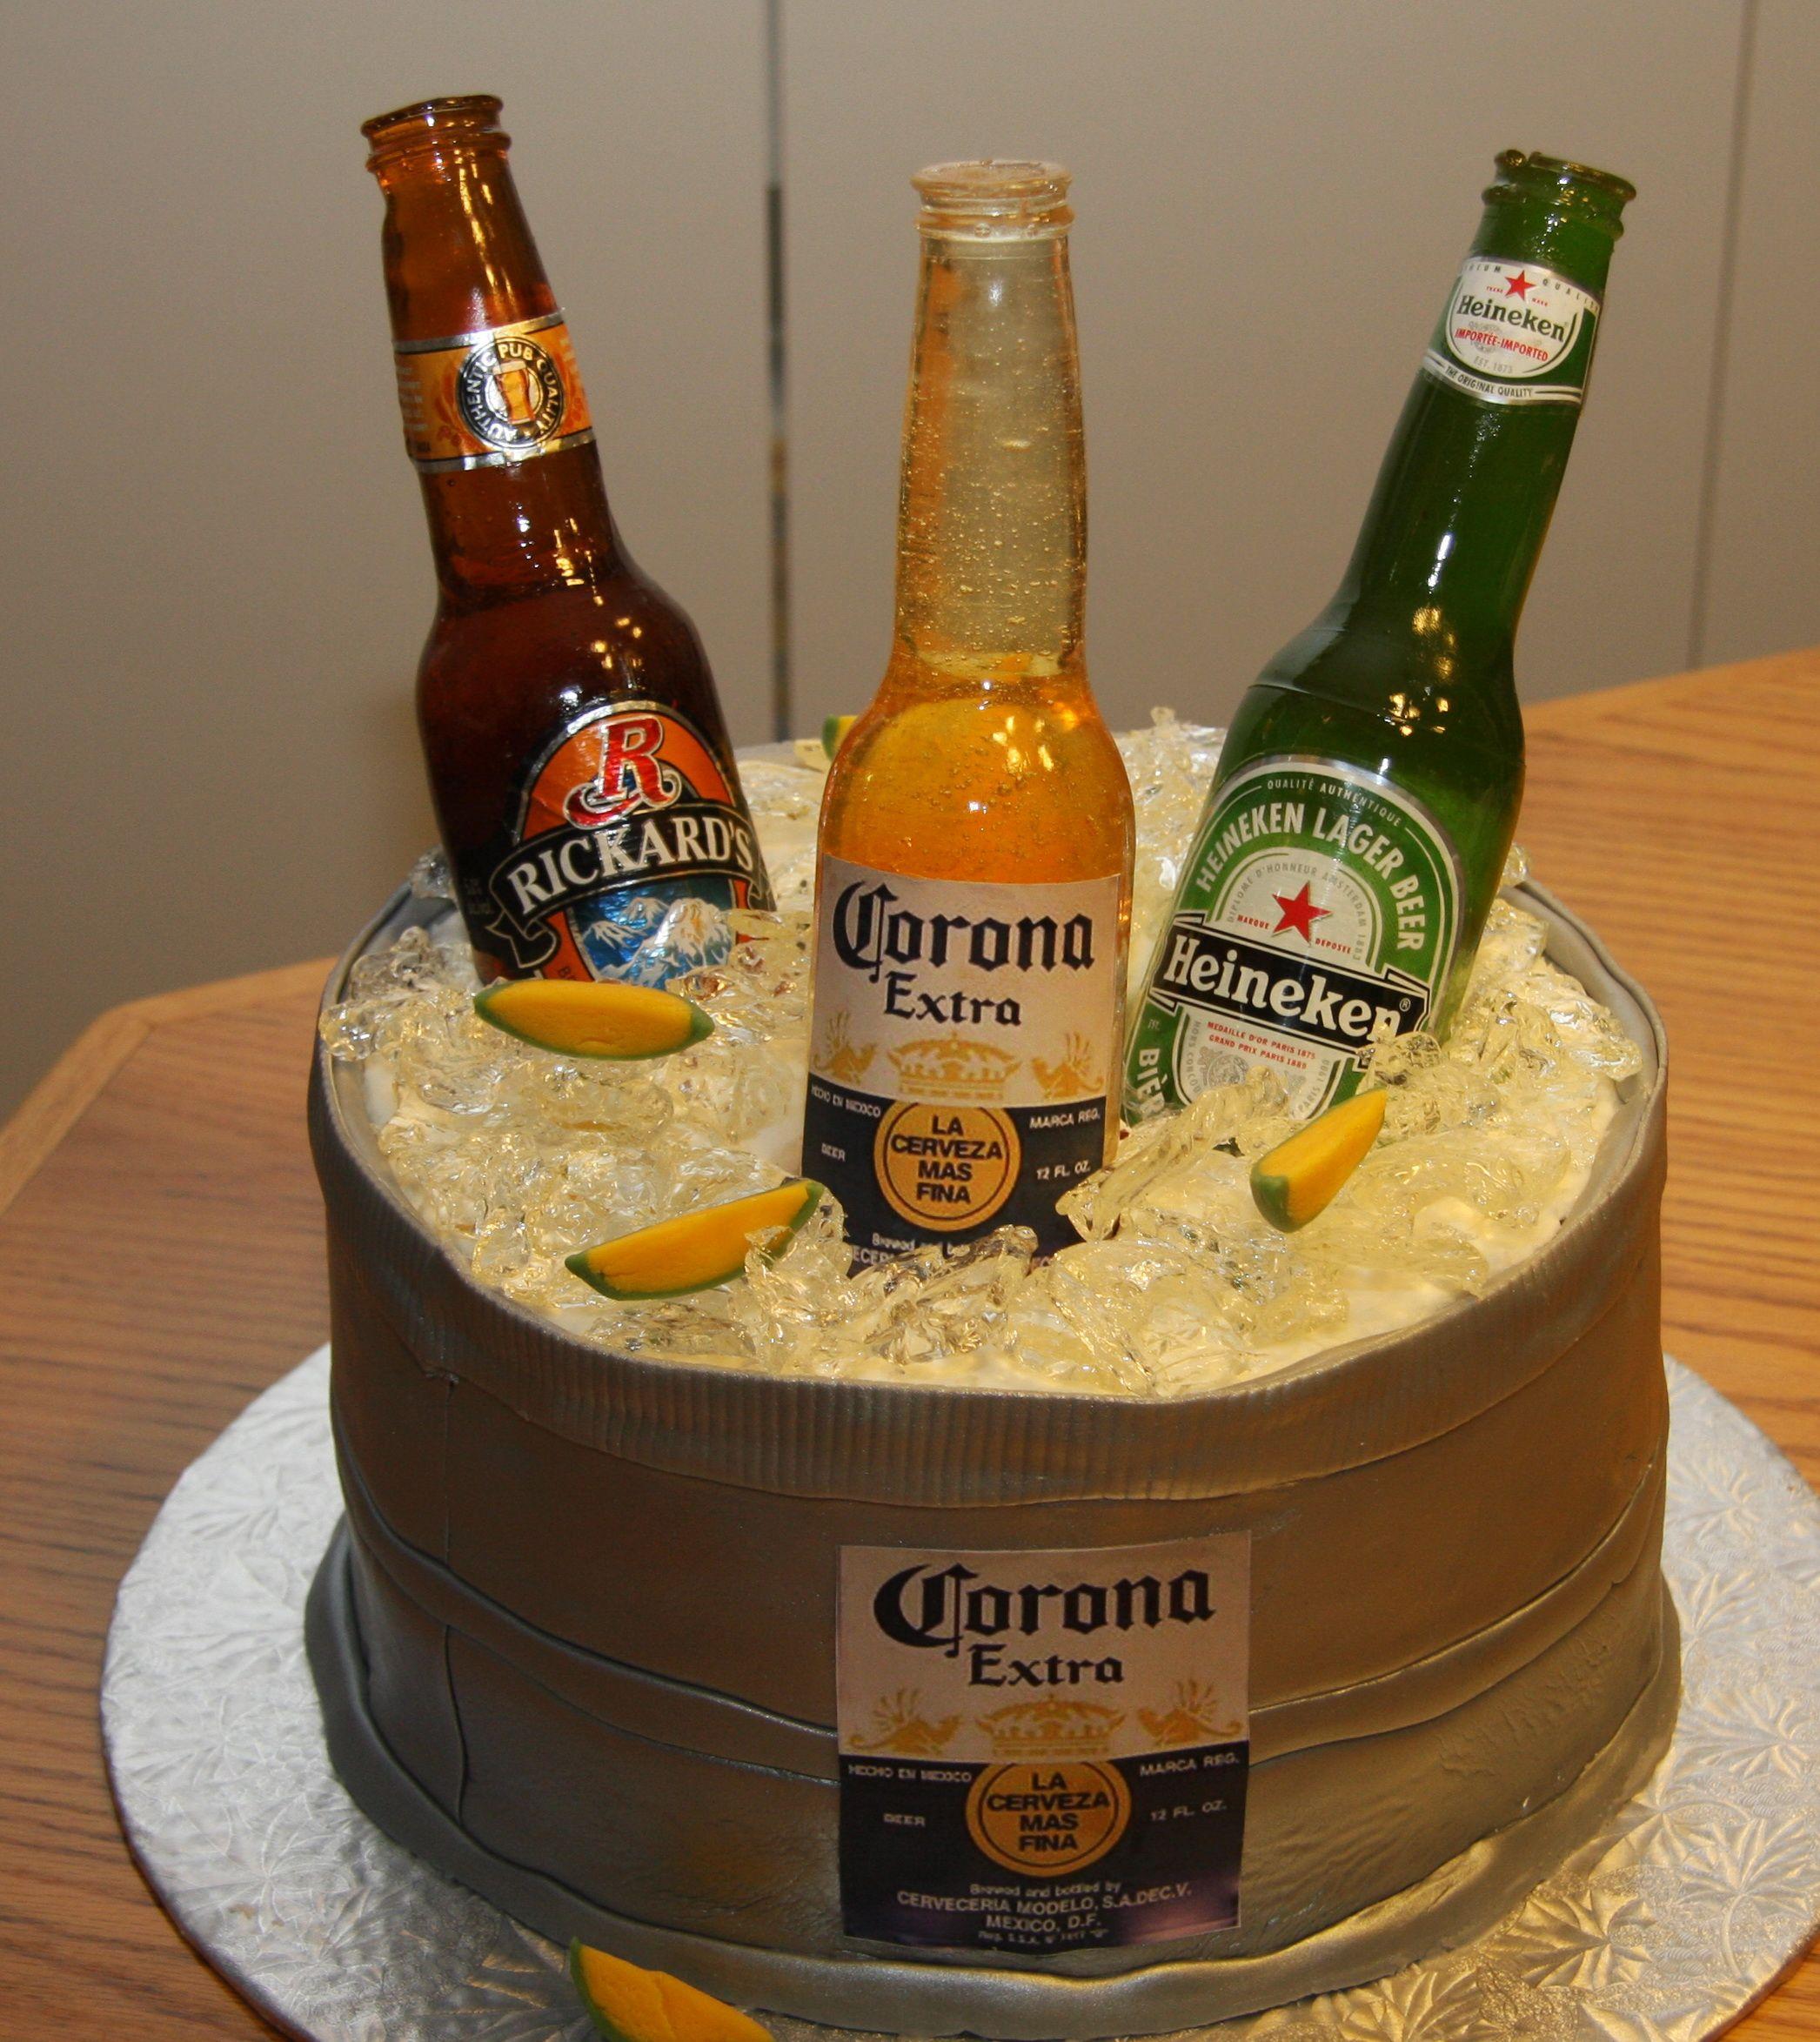 Pin By Leeann Waite On My Cakes Beer Cake Alcohol Cake Liquor Bottle Cake